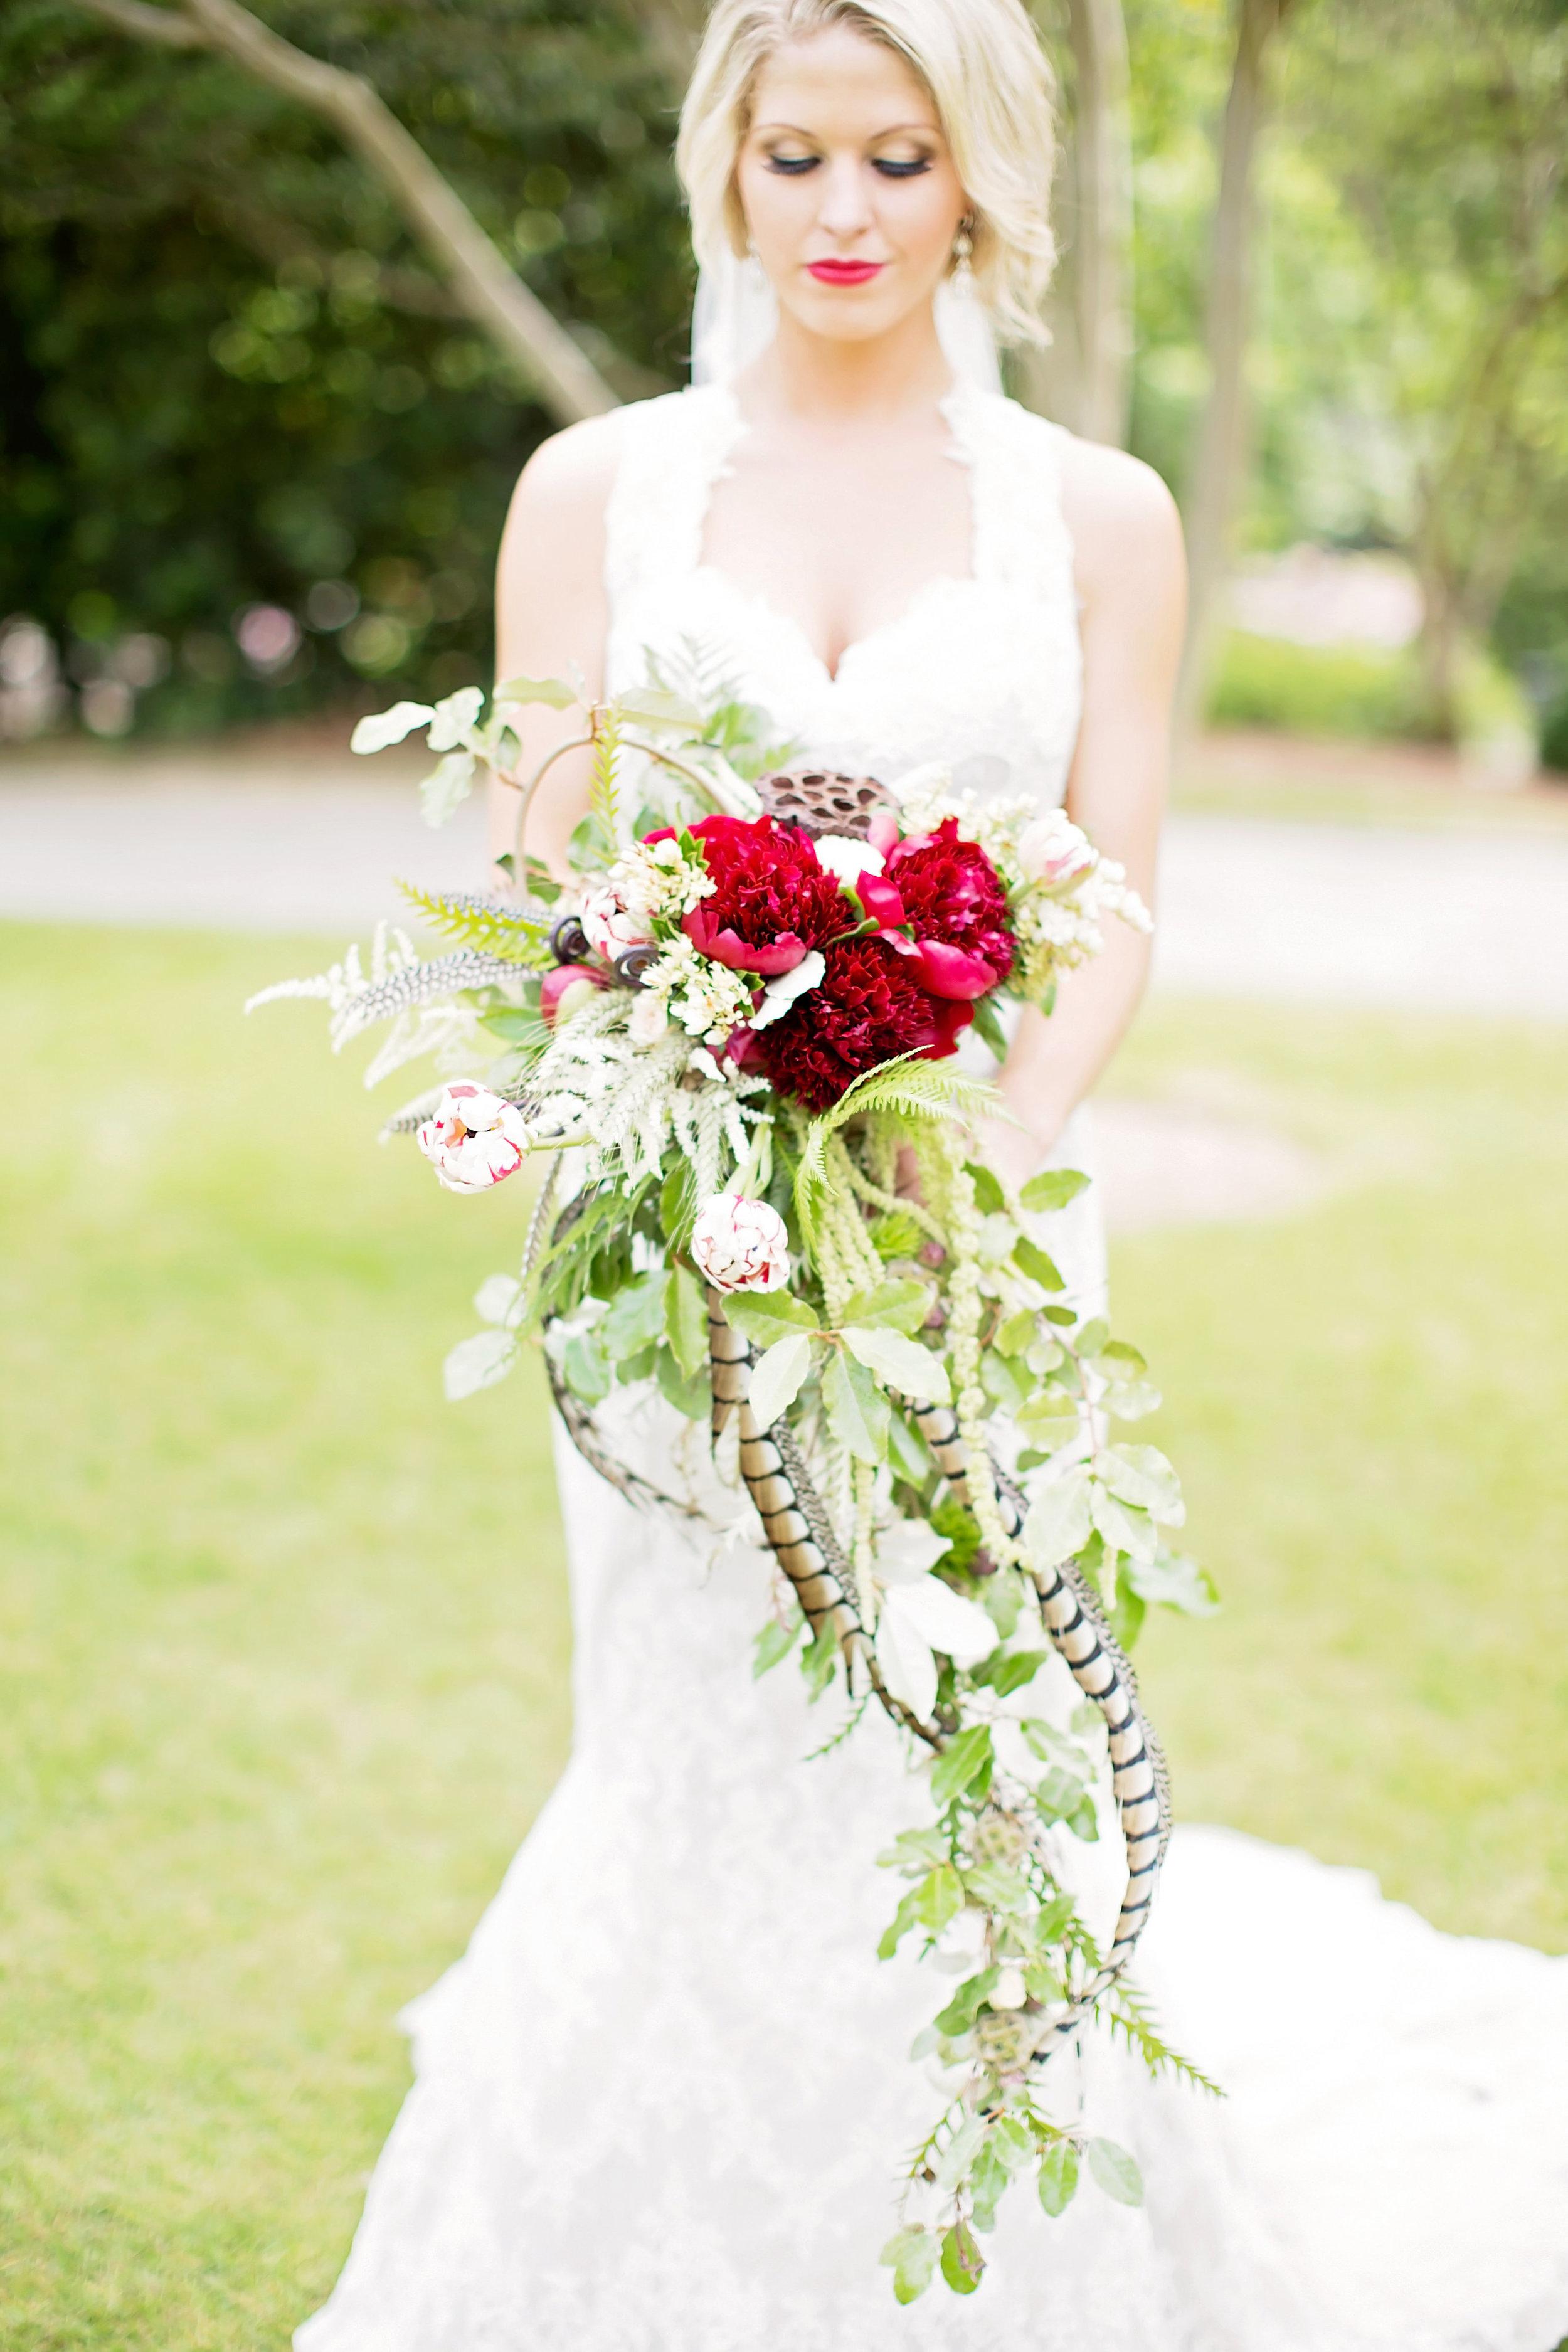 Handley Breaux Designs | Magen Davis Photography | Rachel & Scott Wedding